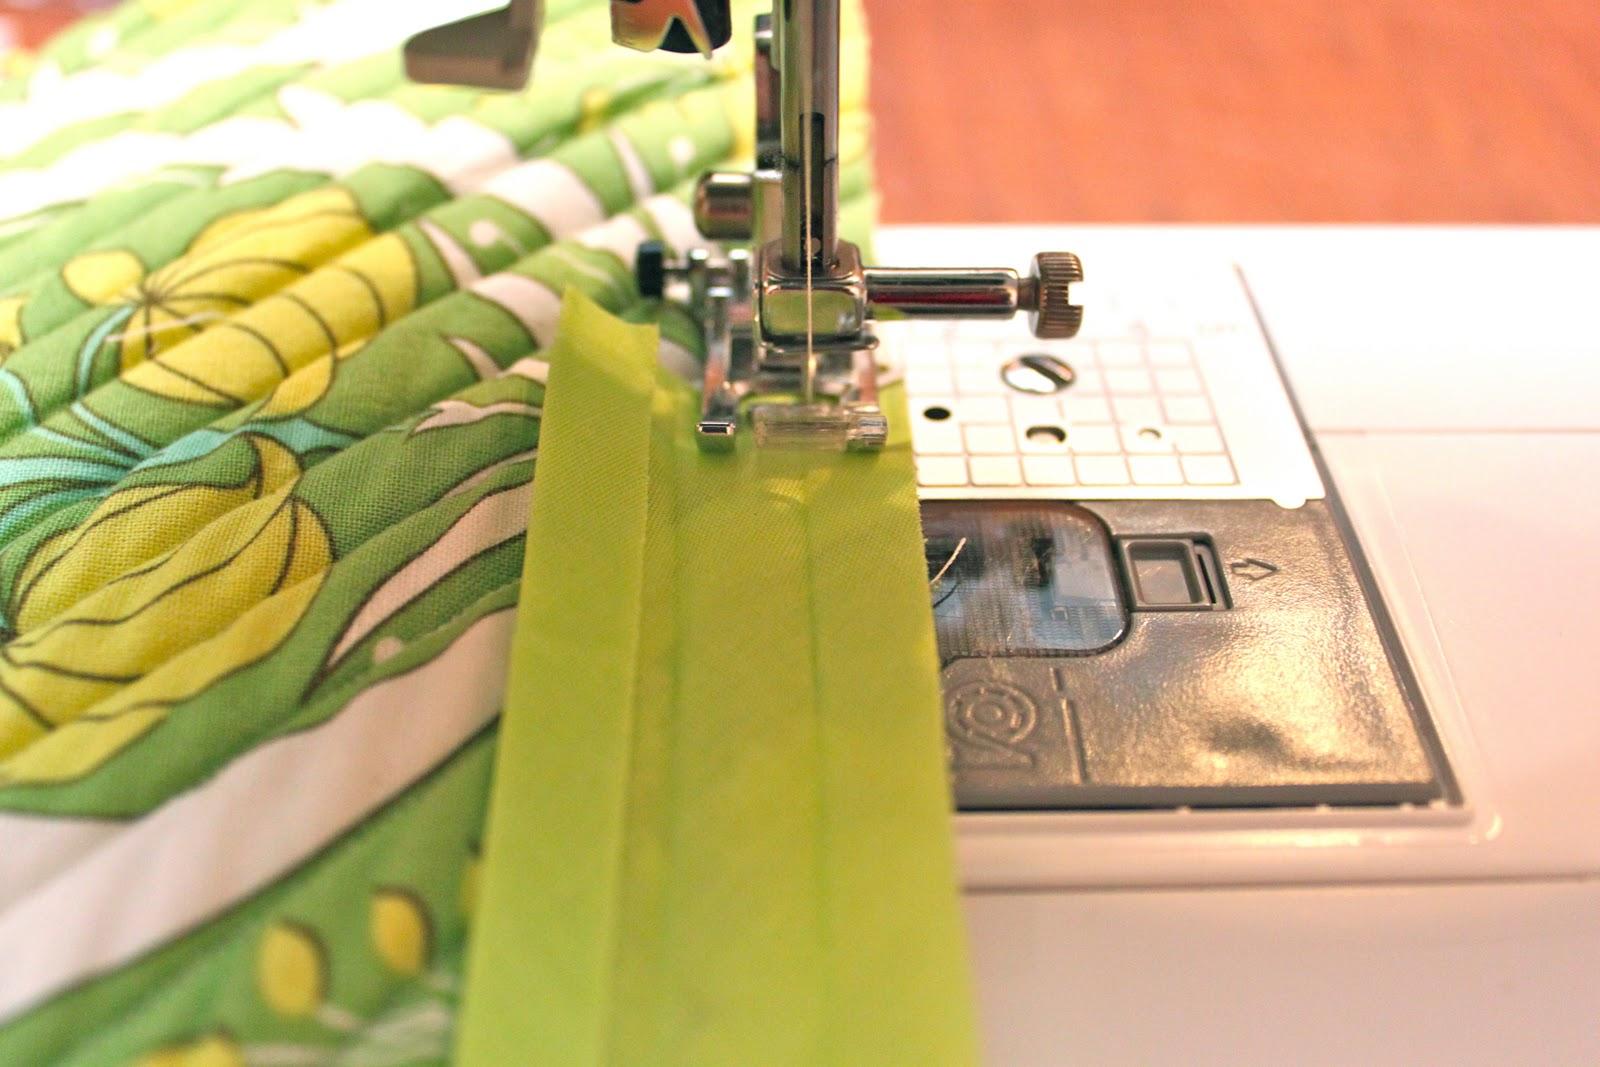 Bias strips quilt